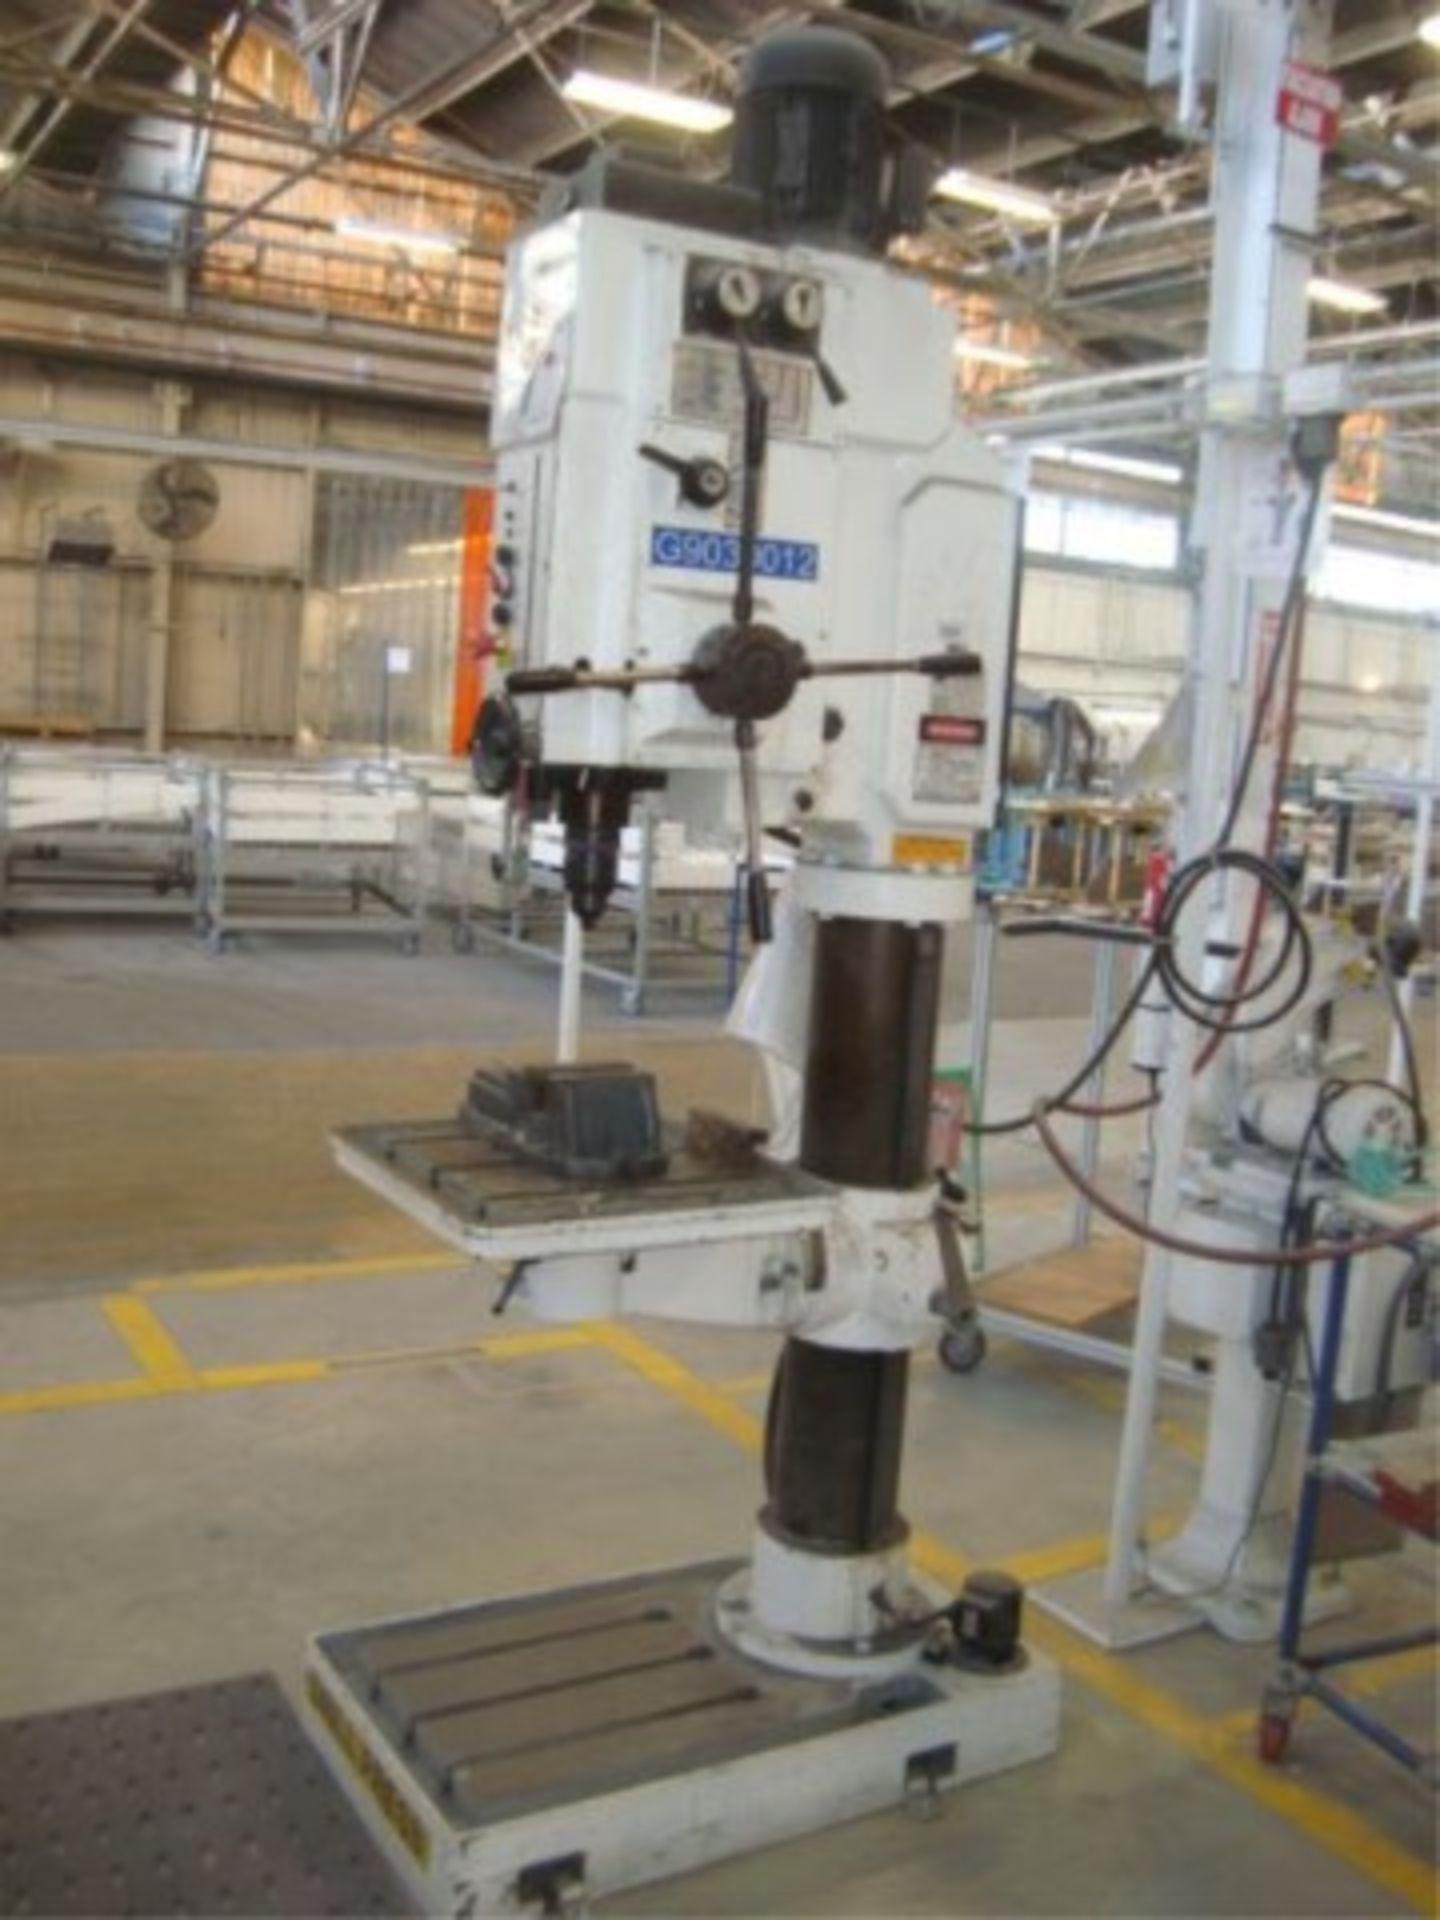 Lot 159 - Heavy Duty Floor Model Drill Press